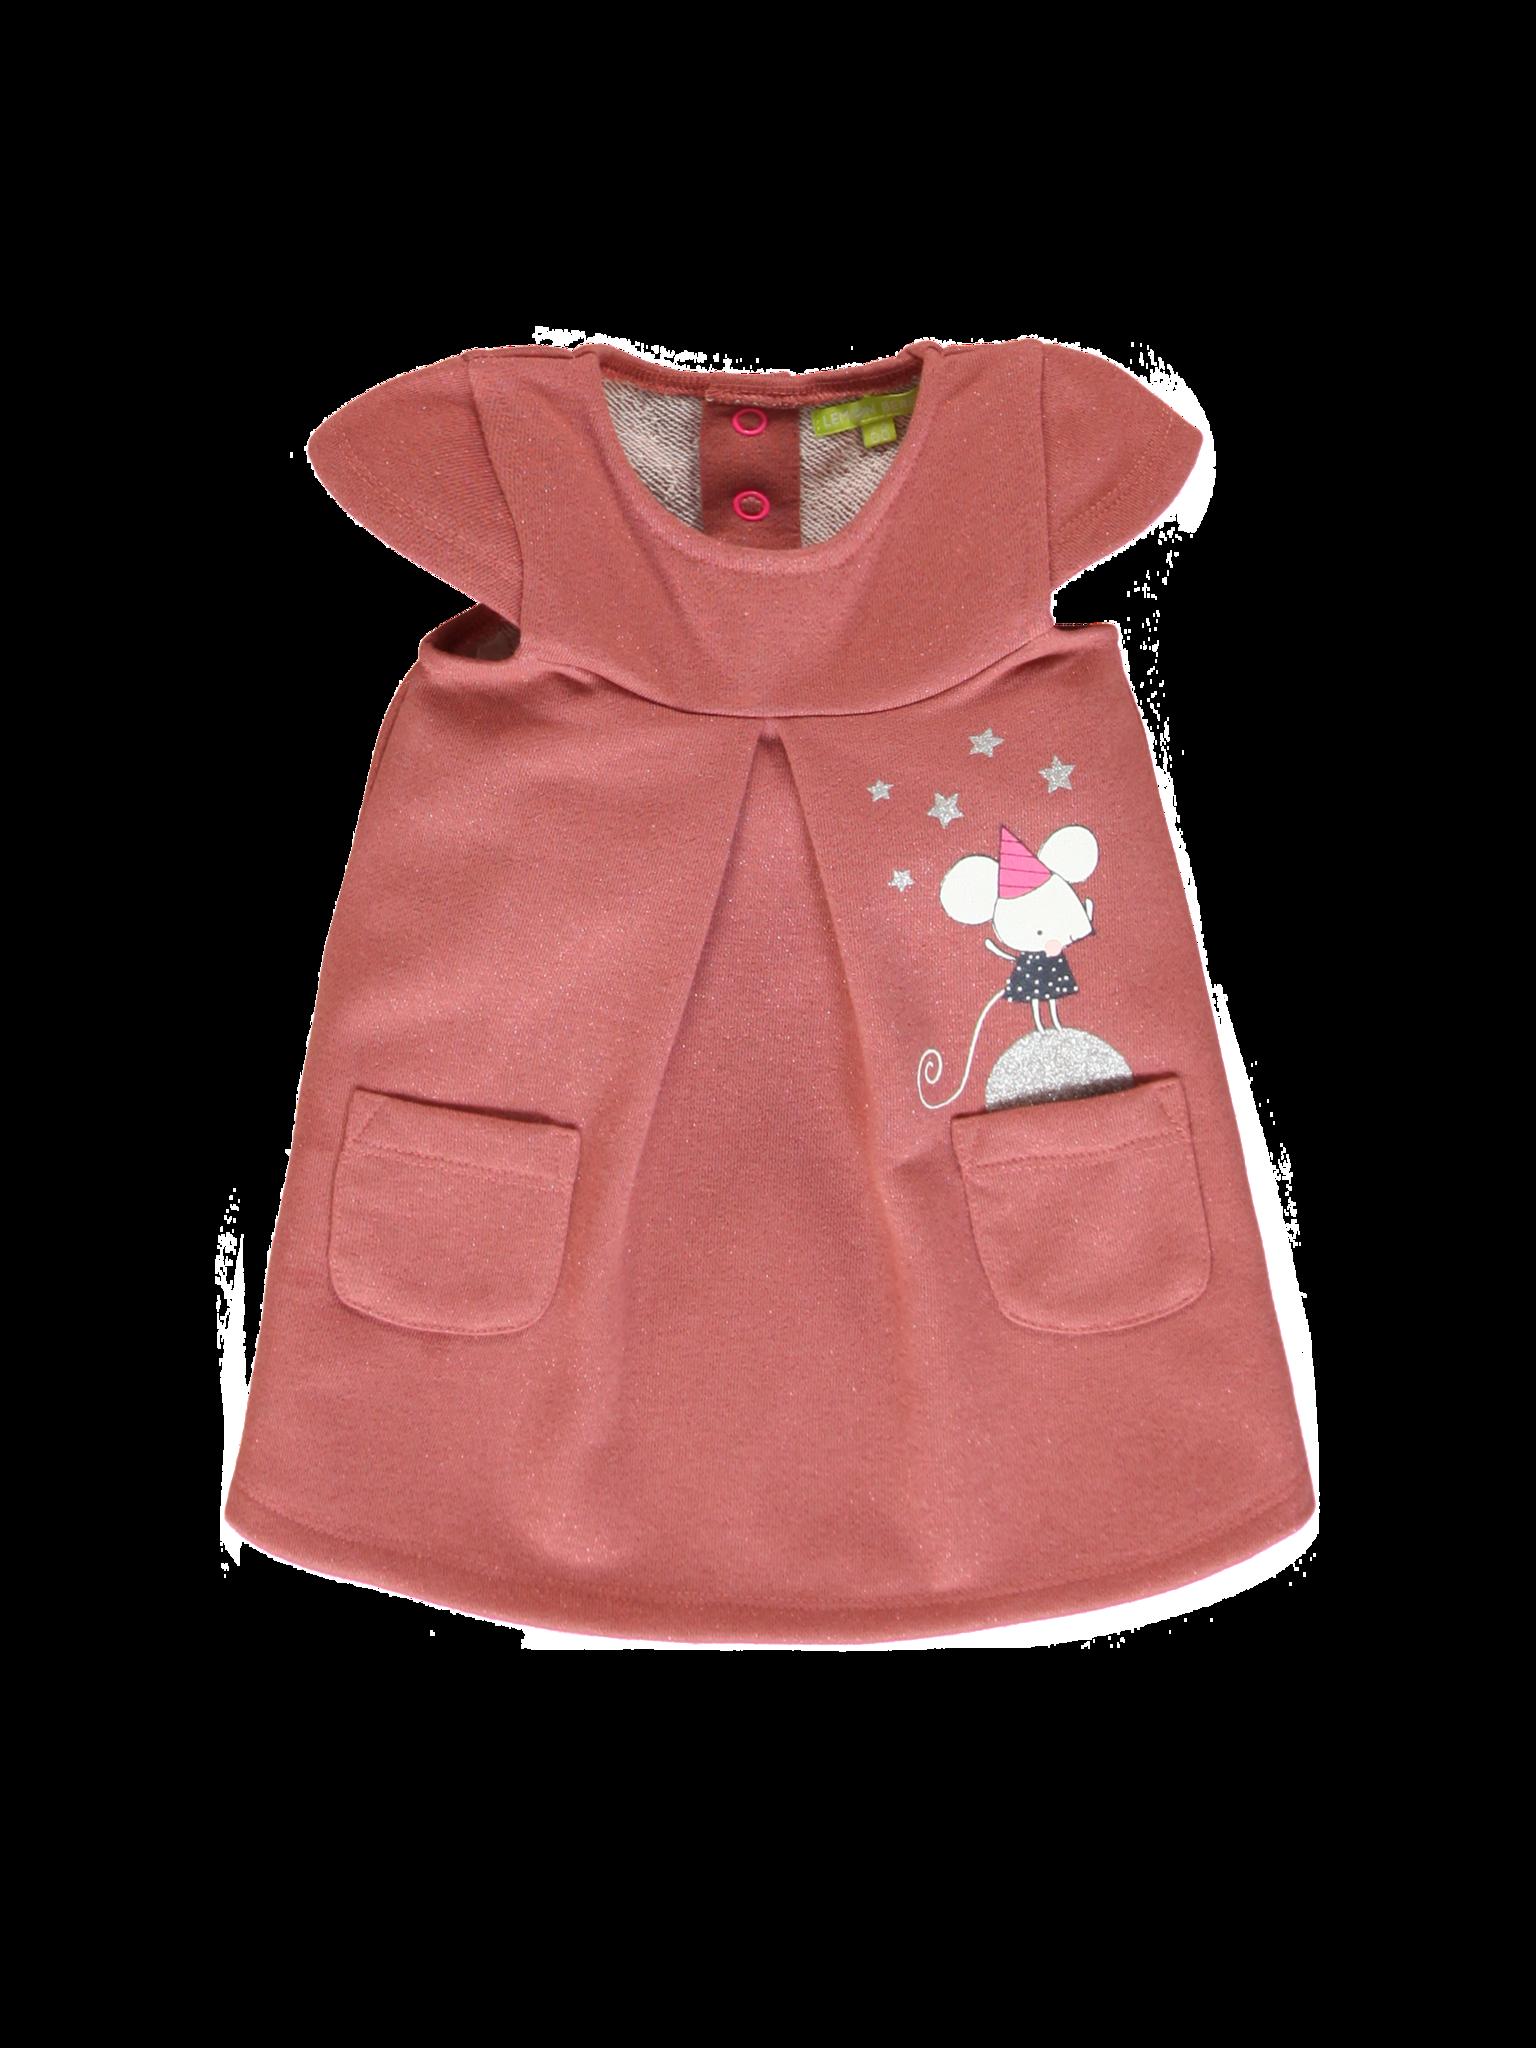 All Brands | Winterproducts Baby | Dress | 8 pcs/box